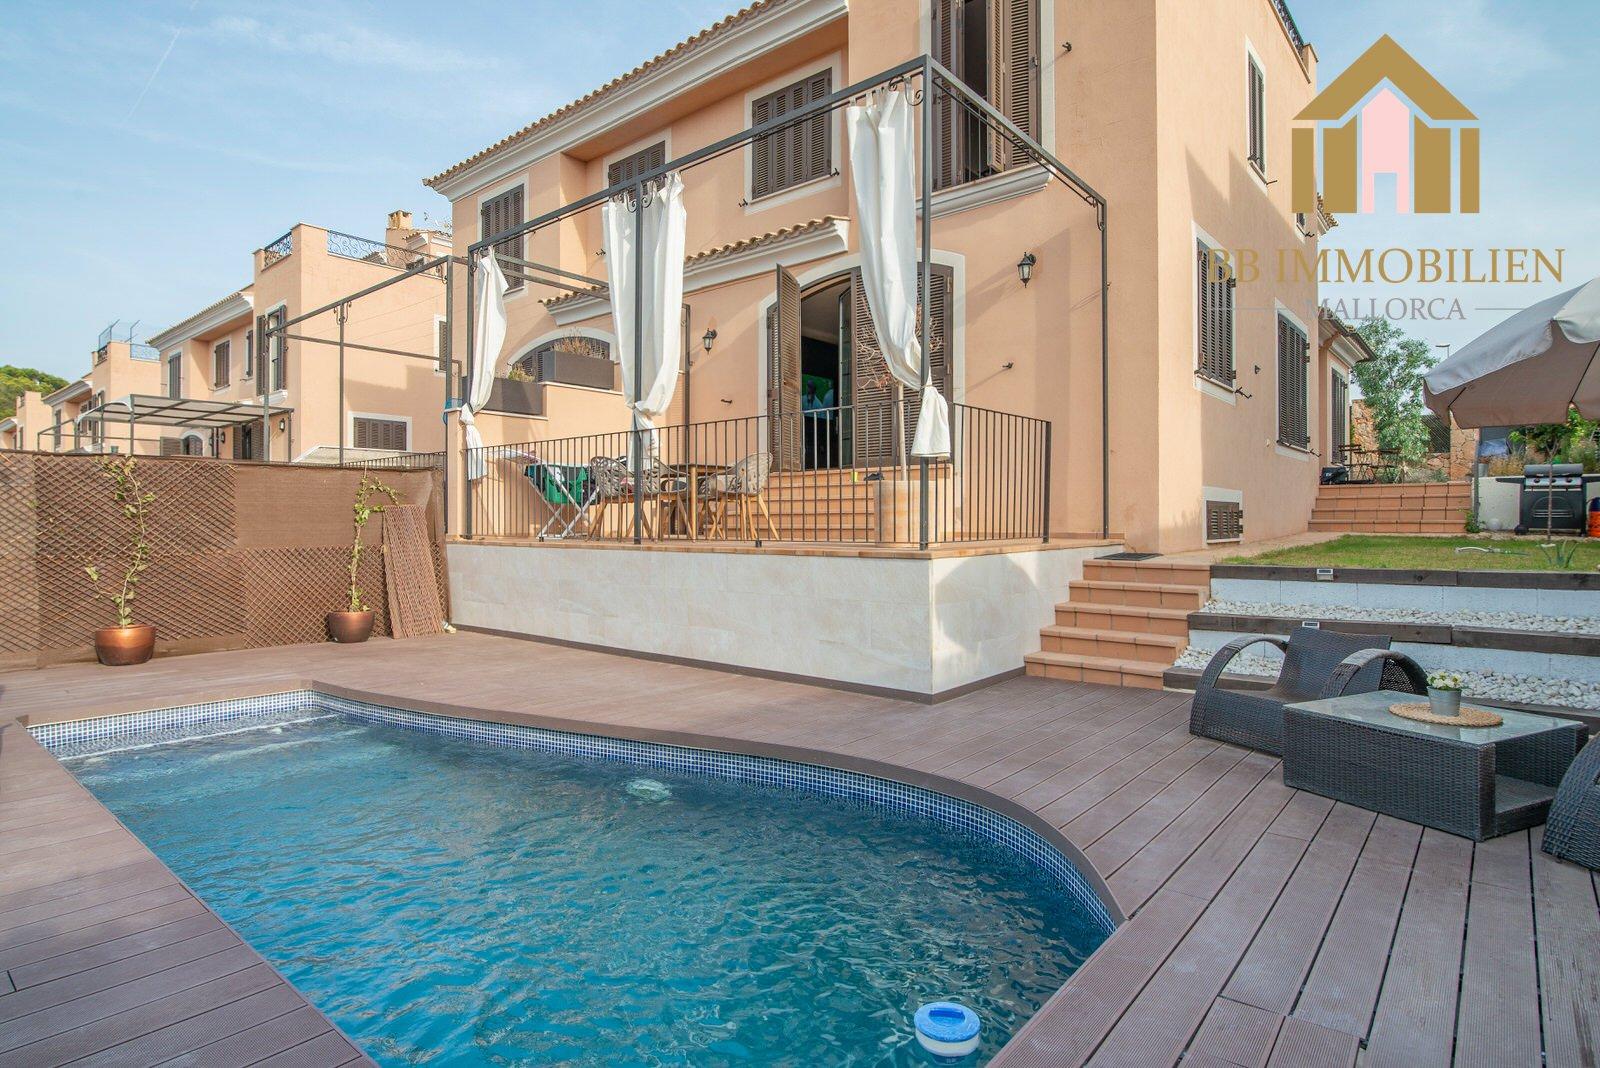 Puig de Ros Doppelhaushälfte mit Pool und Garten Nähe Palma